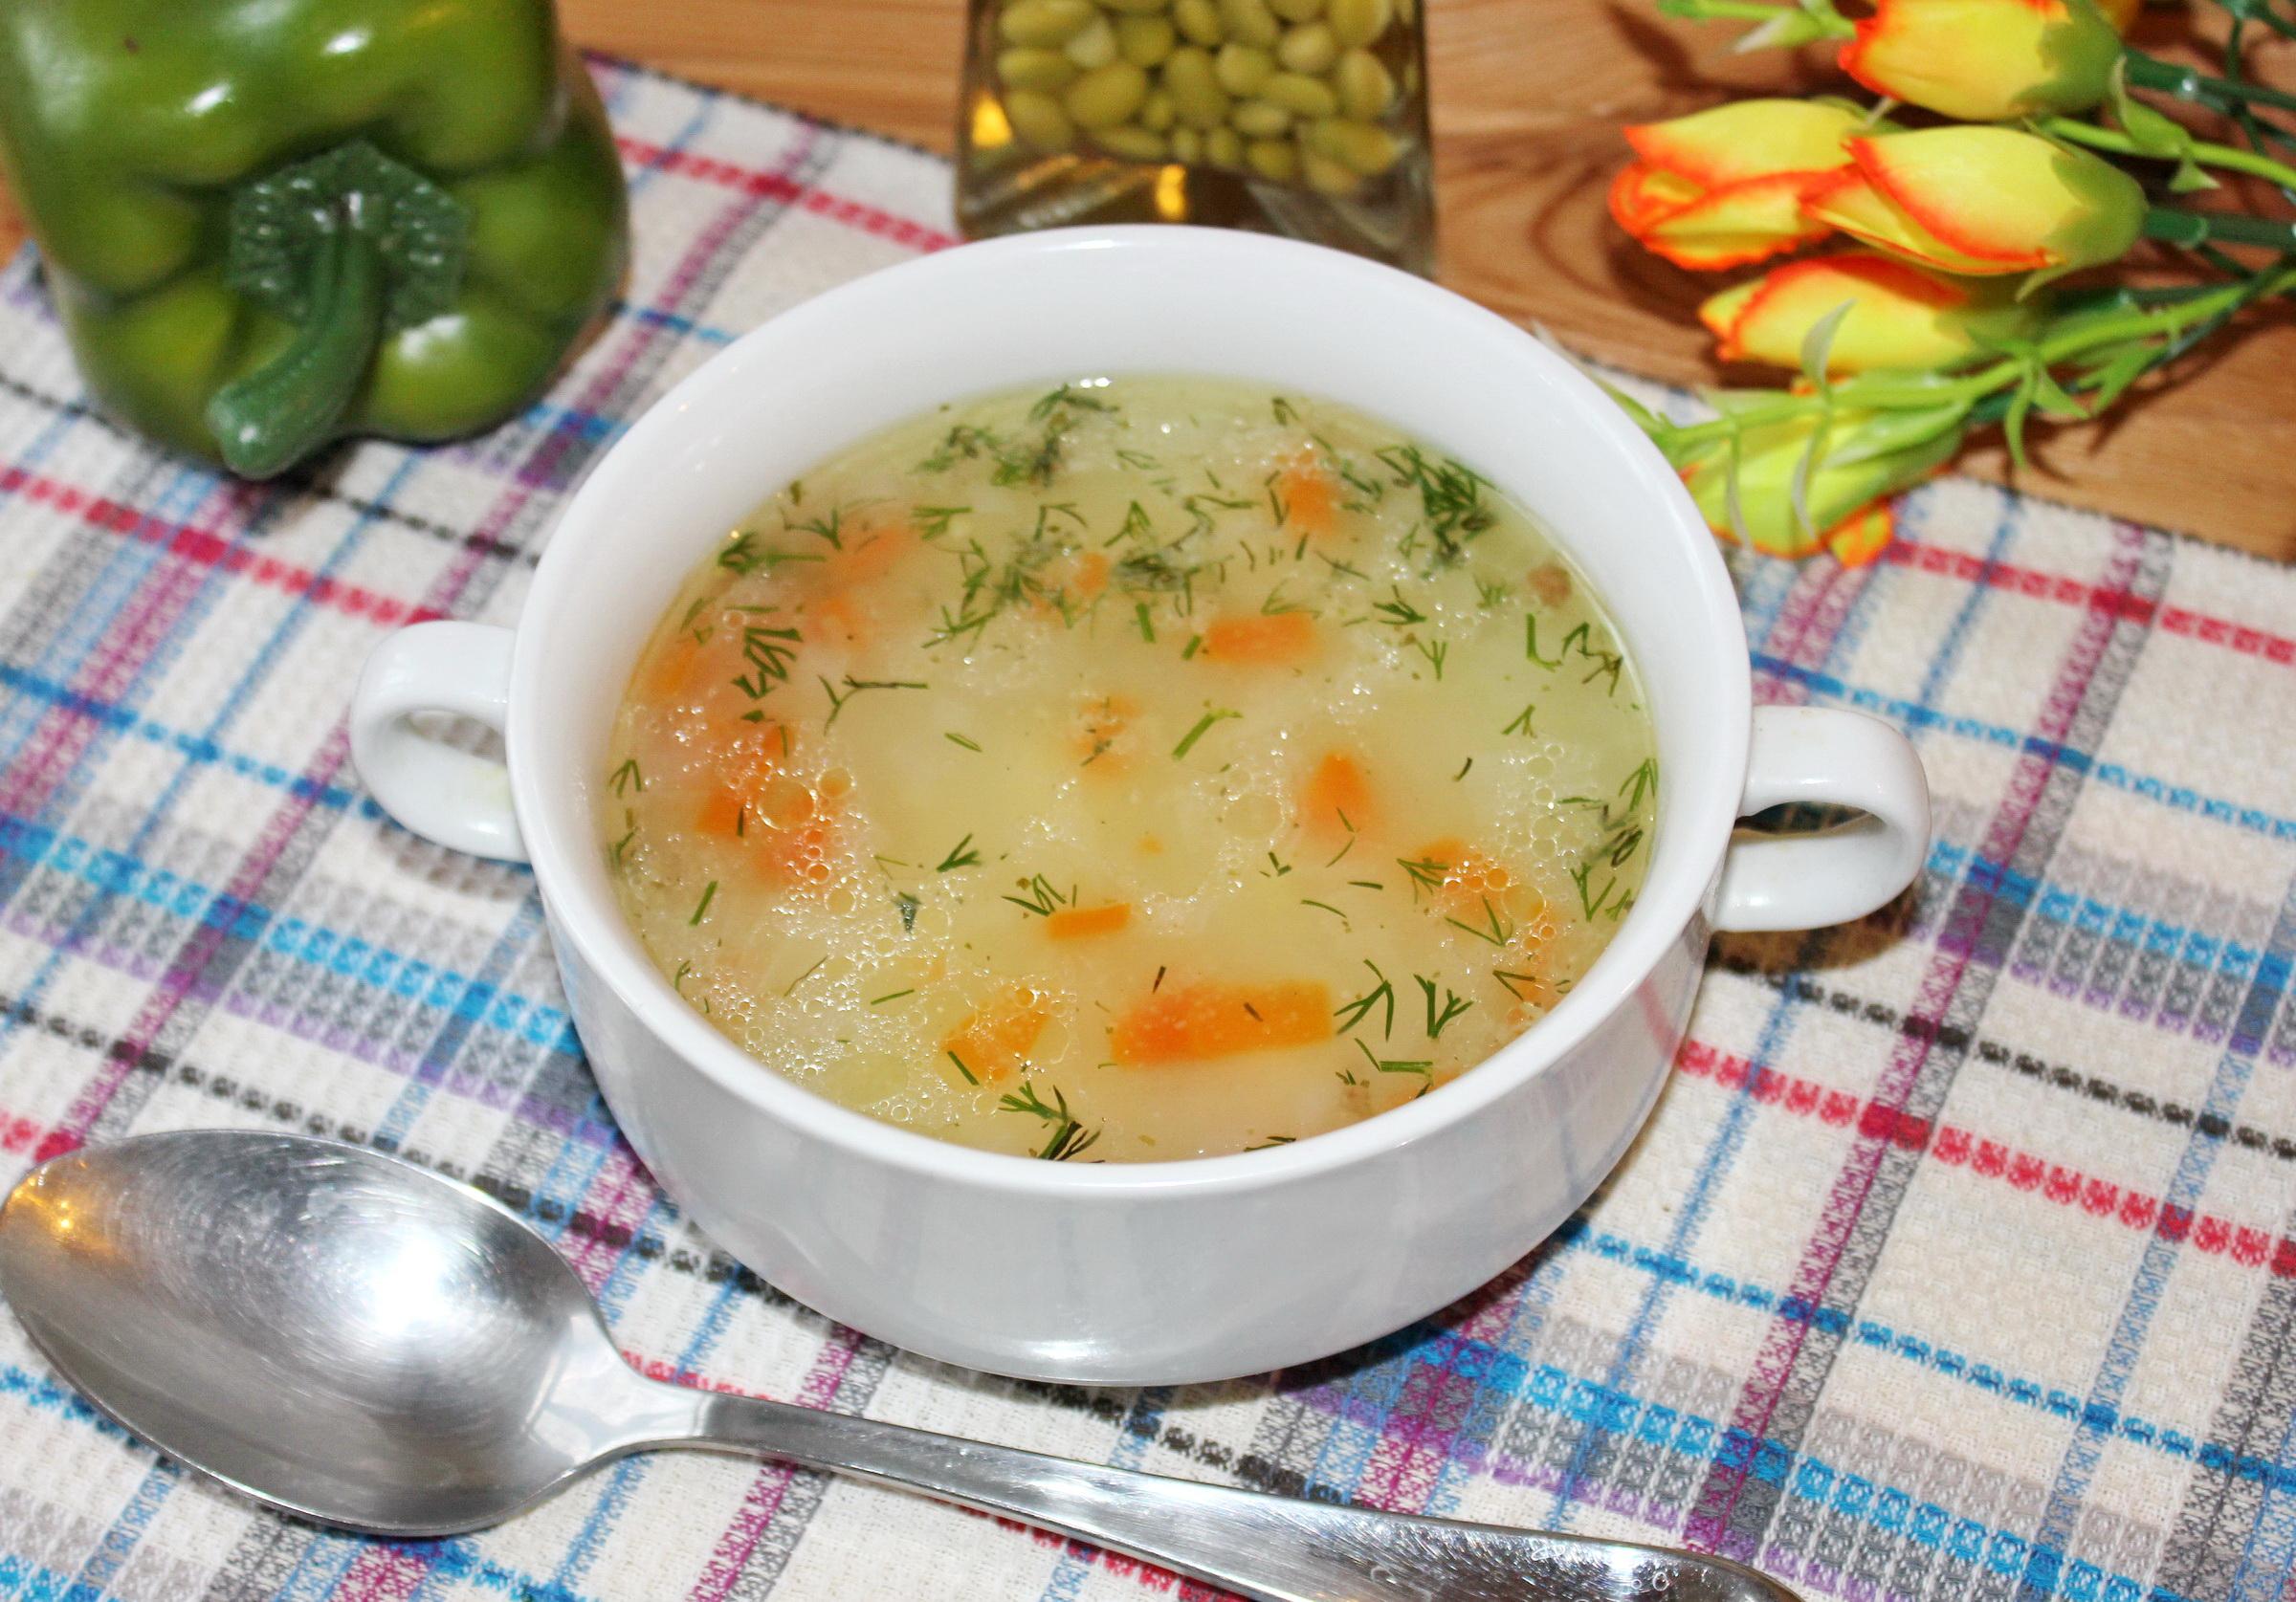 Тесто для пасхи рецепт с фото жилья иркутске